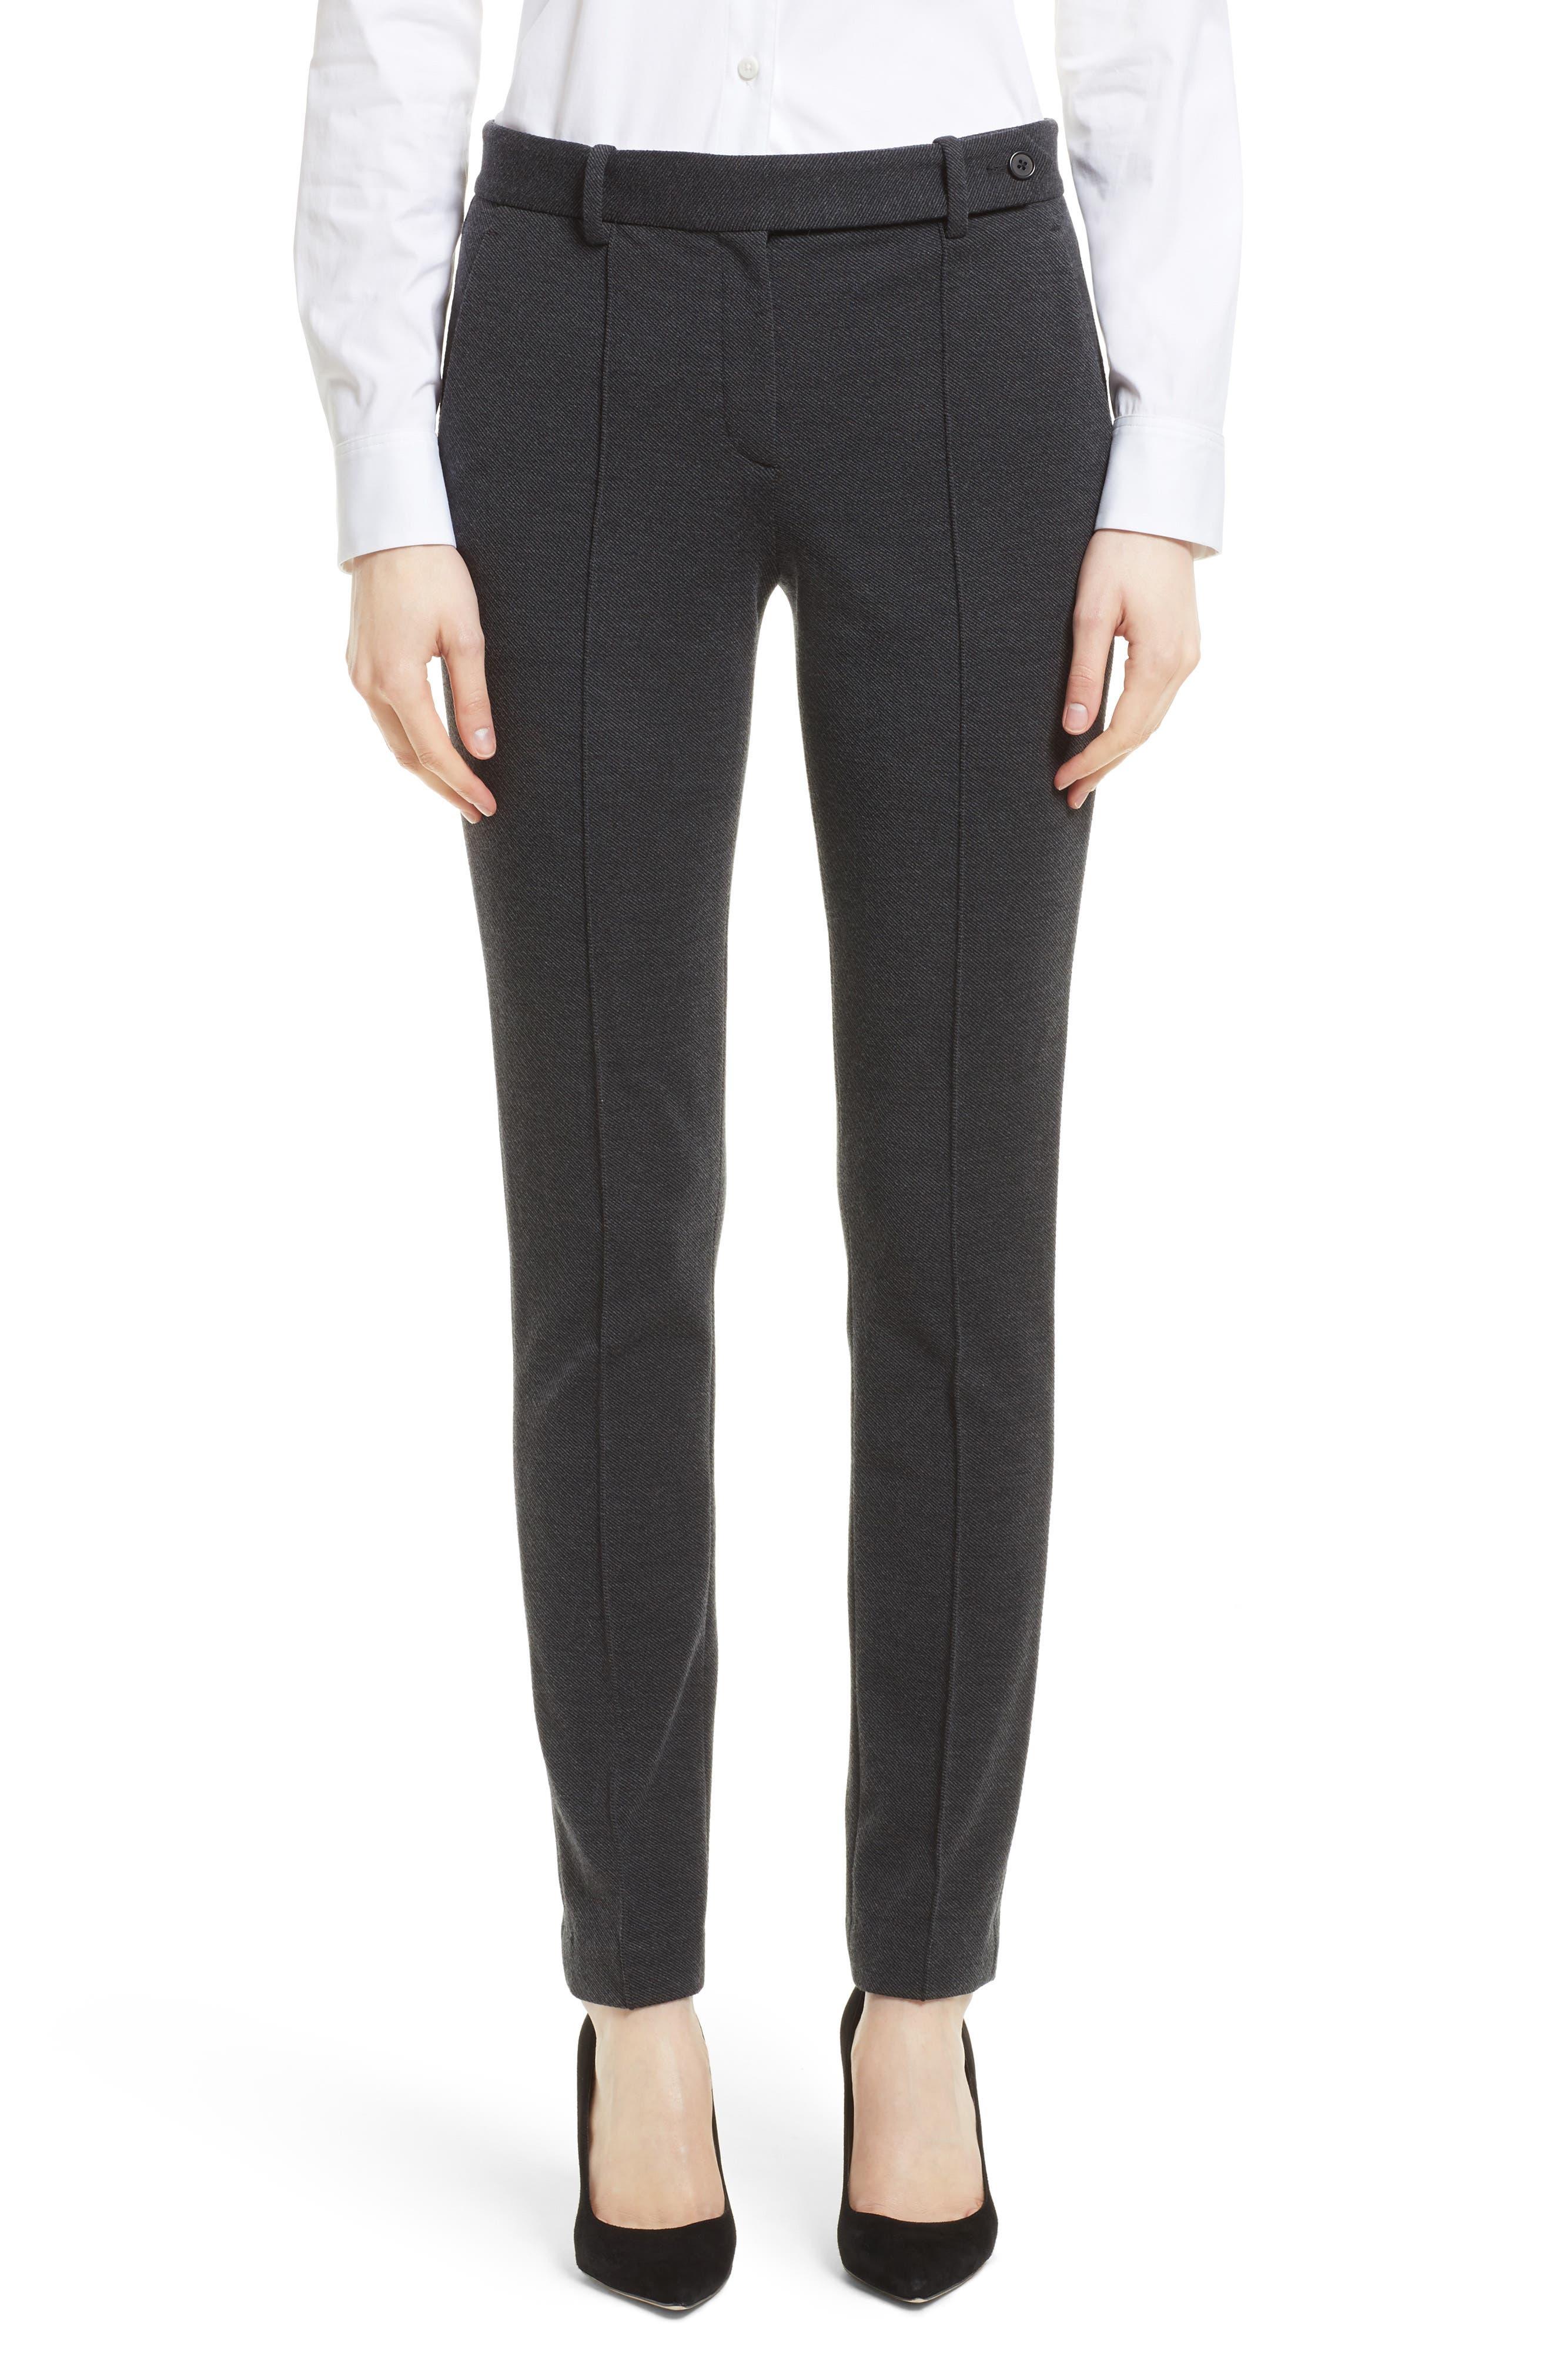 Pintuck Knit Twill Pants,                         Main,                         color, Dark Charcoal